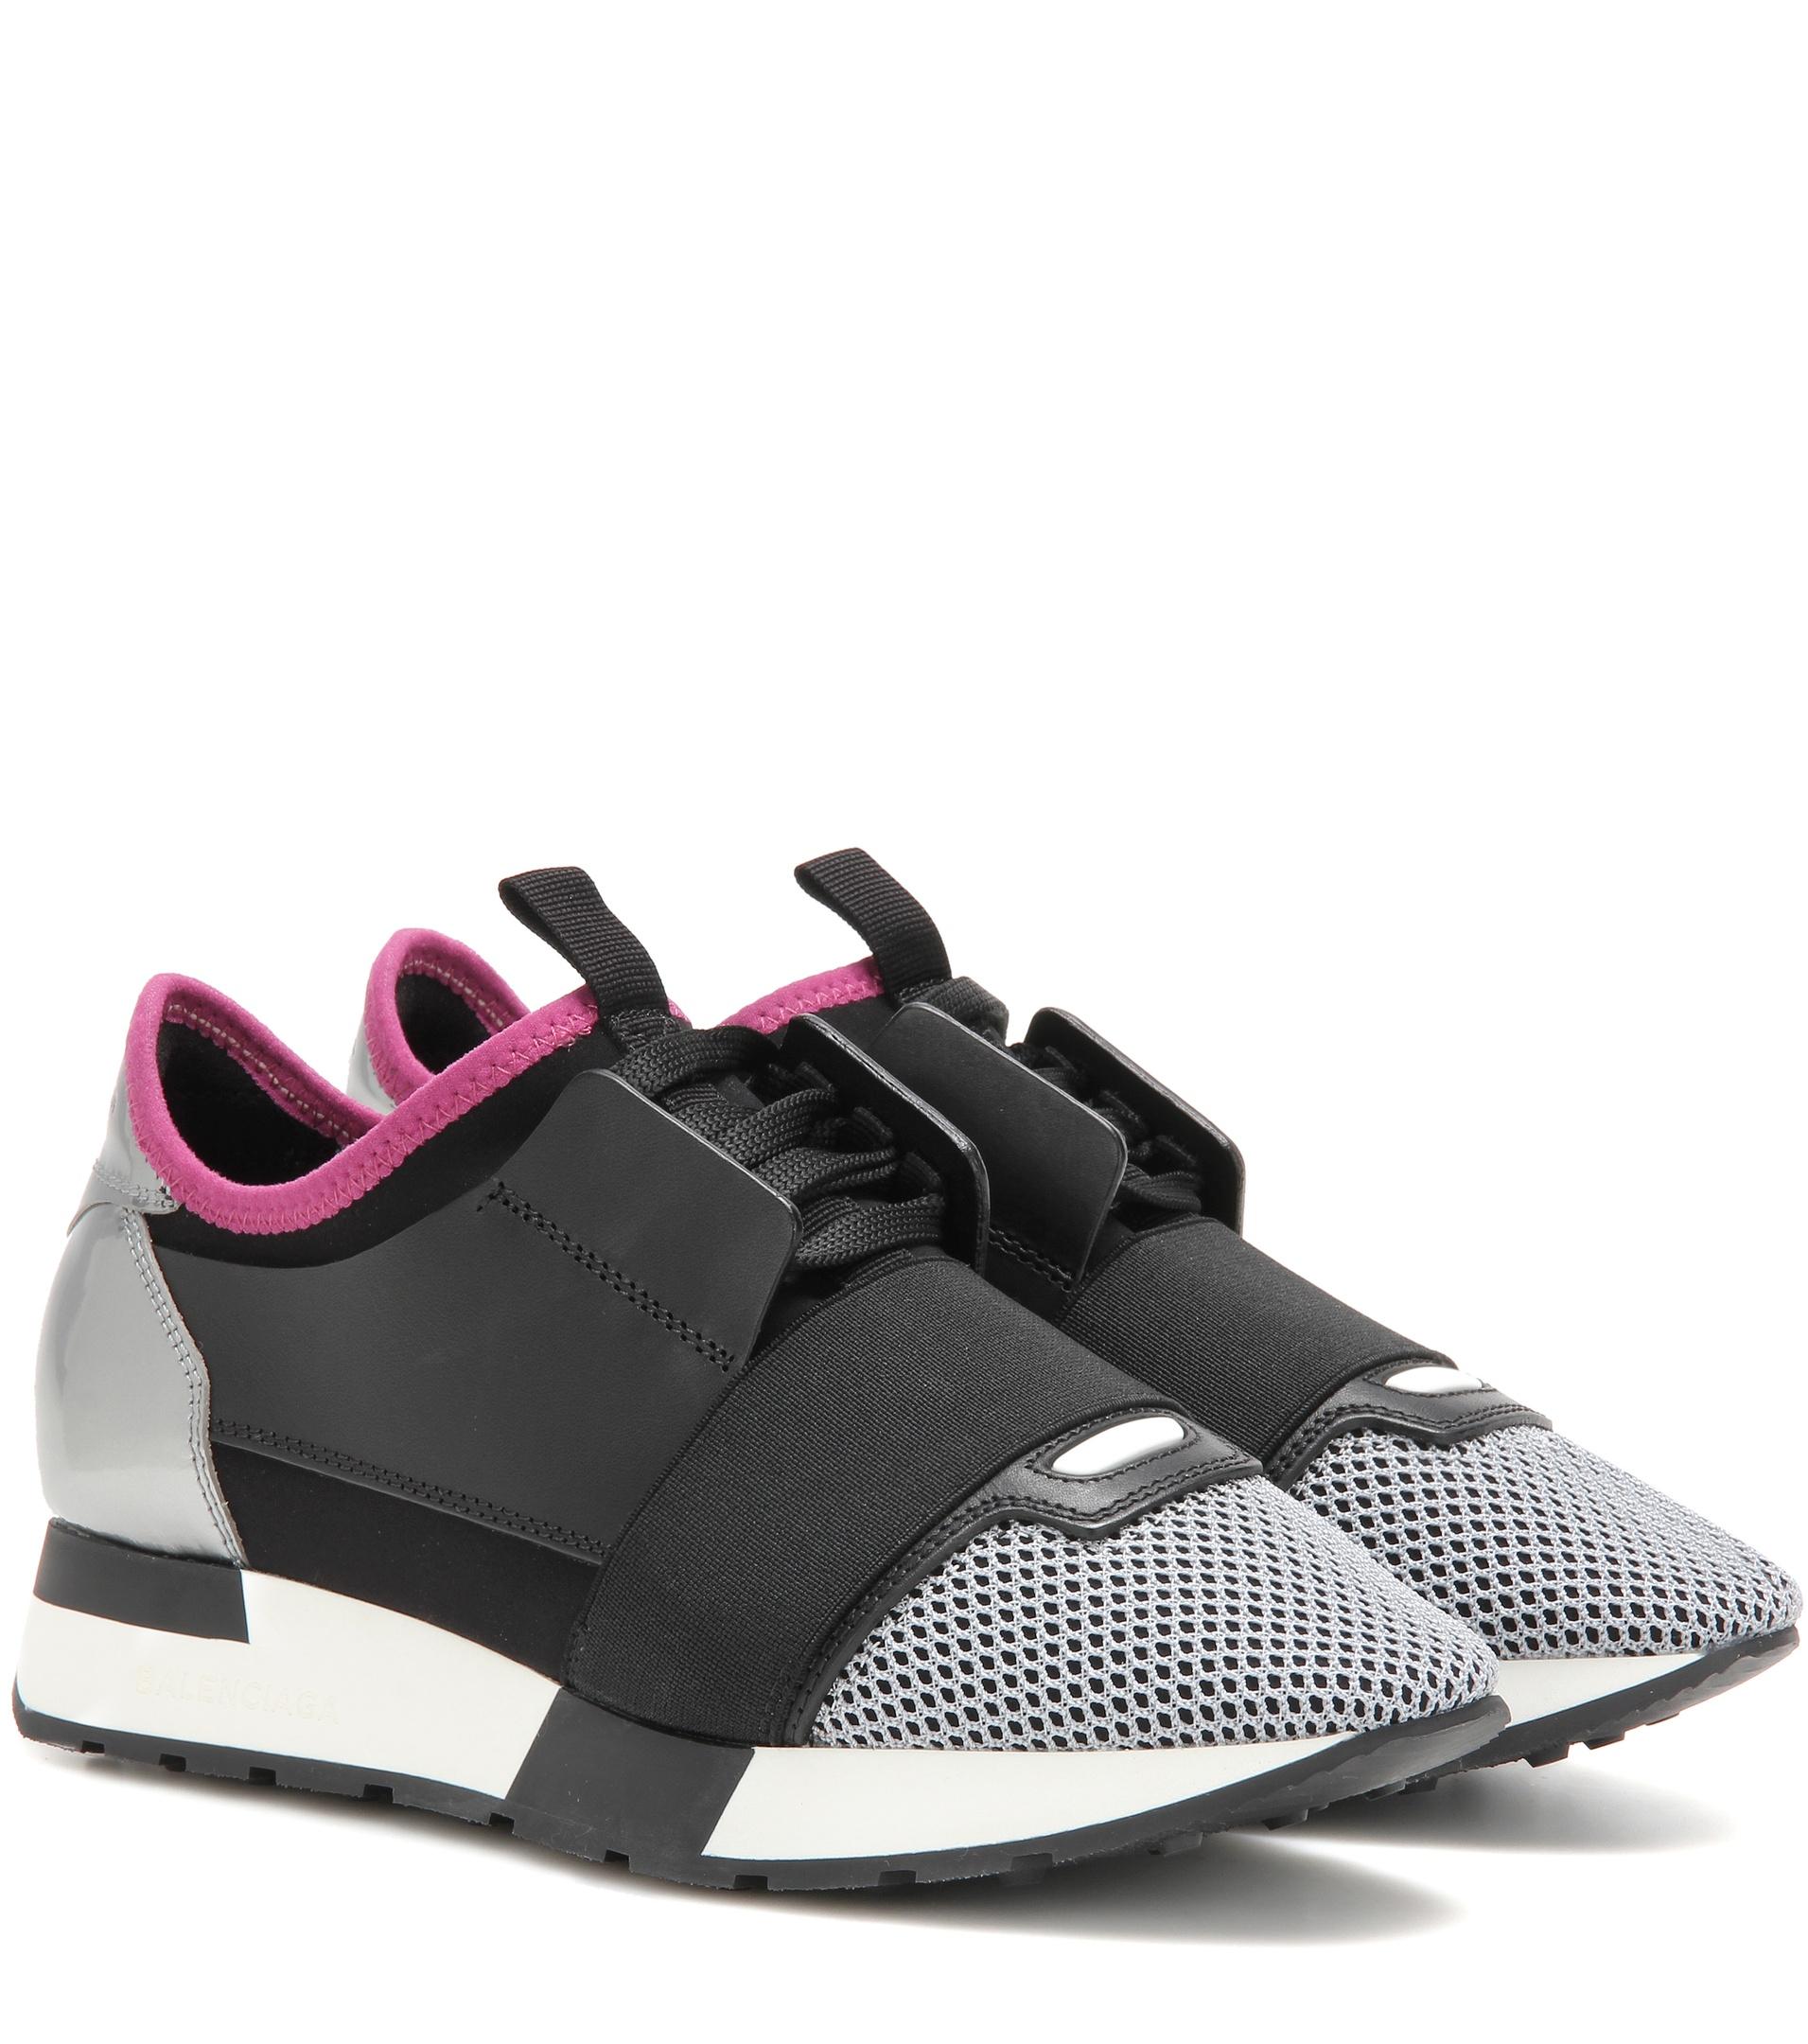 Balenciaga Race Runner Leather Mesh And Neoprene Sneakers